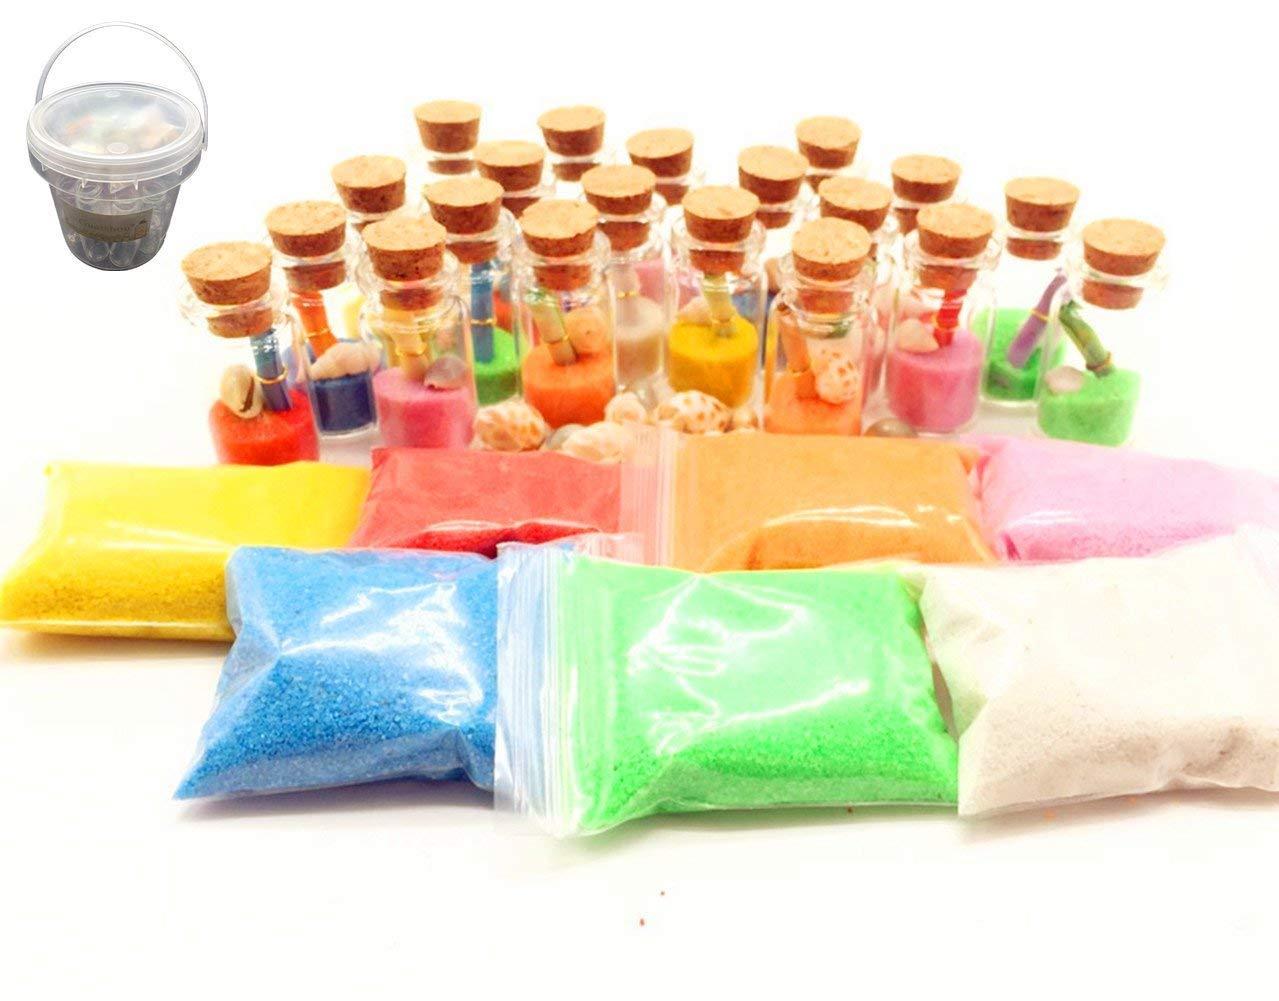 Guaishou DIY Arts and Crafts Kit Wishing Bottles Art Glass Bottles with Cork Colorful Rainbow Sand Sea Shells Mixed Beach Seashells (Vial A)